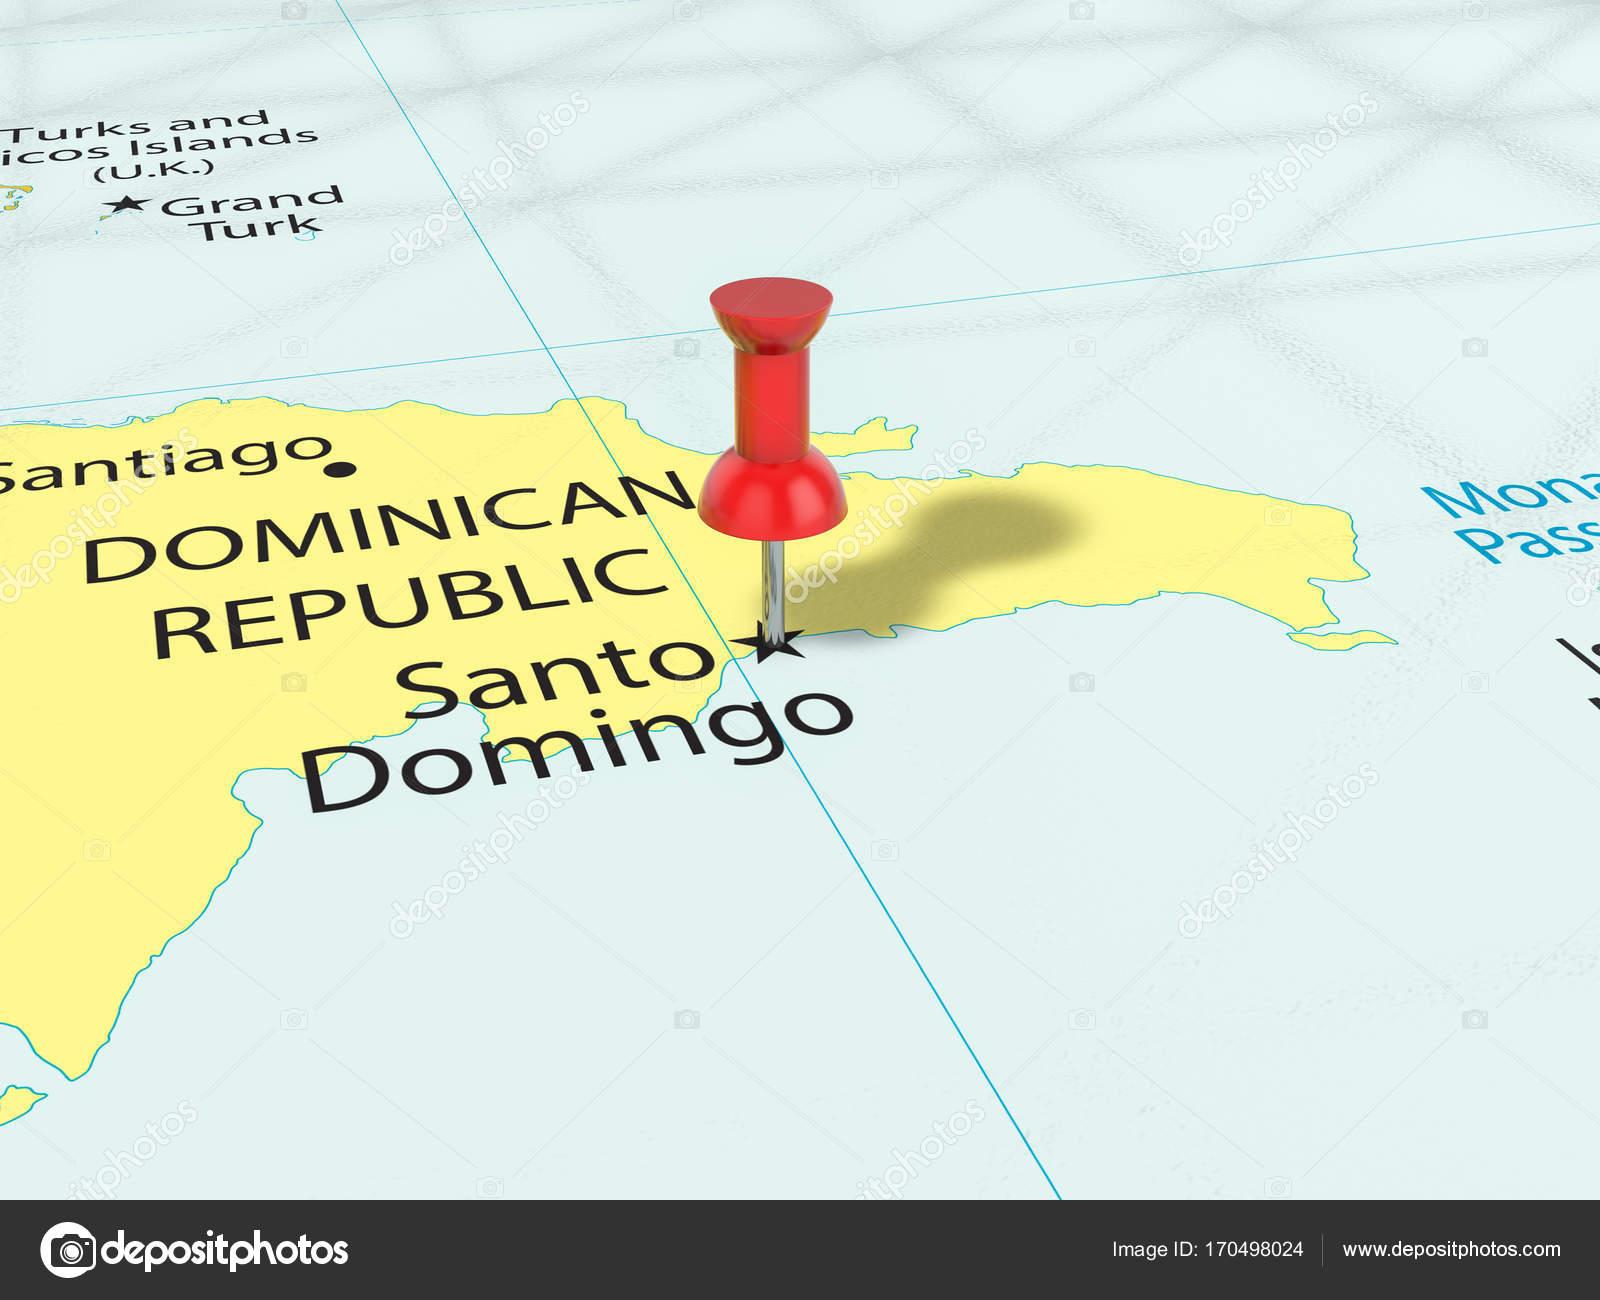 Pushpin on Santo Domingo map — Stock Photo © julydfg #170498024 on managua map, la romana map, yucatan peninsula map, san salvador map, el salvador map, la havana map, port au prince on map, saint-domingue map, jamaica map, dominican republic map, caribbean map, punta cana map, havana cuba map, san juan map, quito map, belmopan map, toronto map, haiti map, puerto rico map, caracas map,